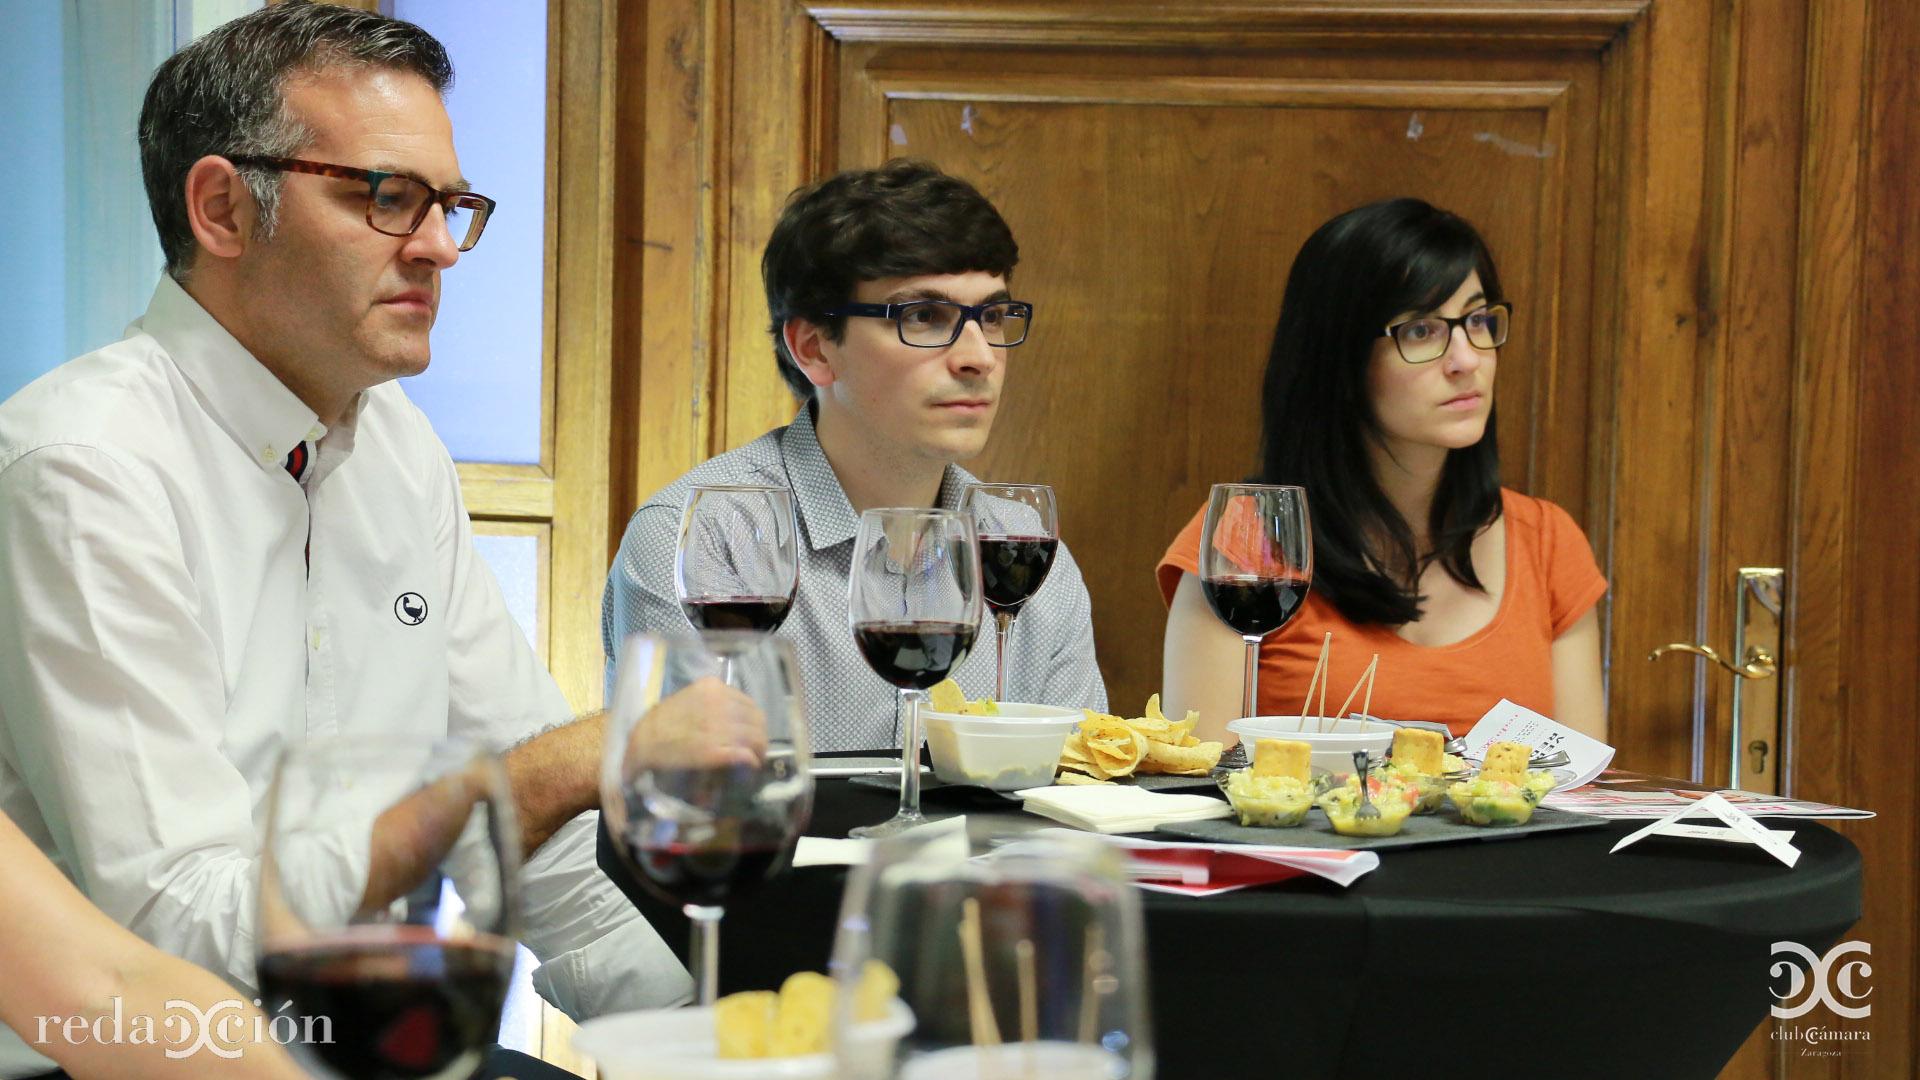 Javier Andonegui, Daniel Ponz y Carolina Marín.